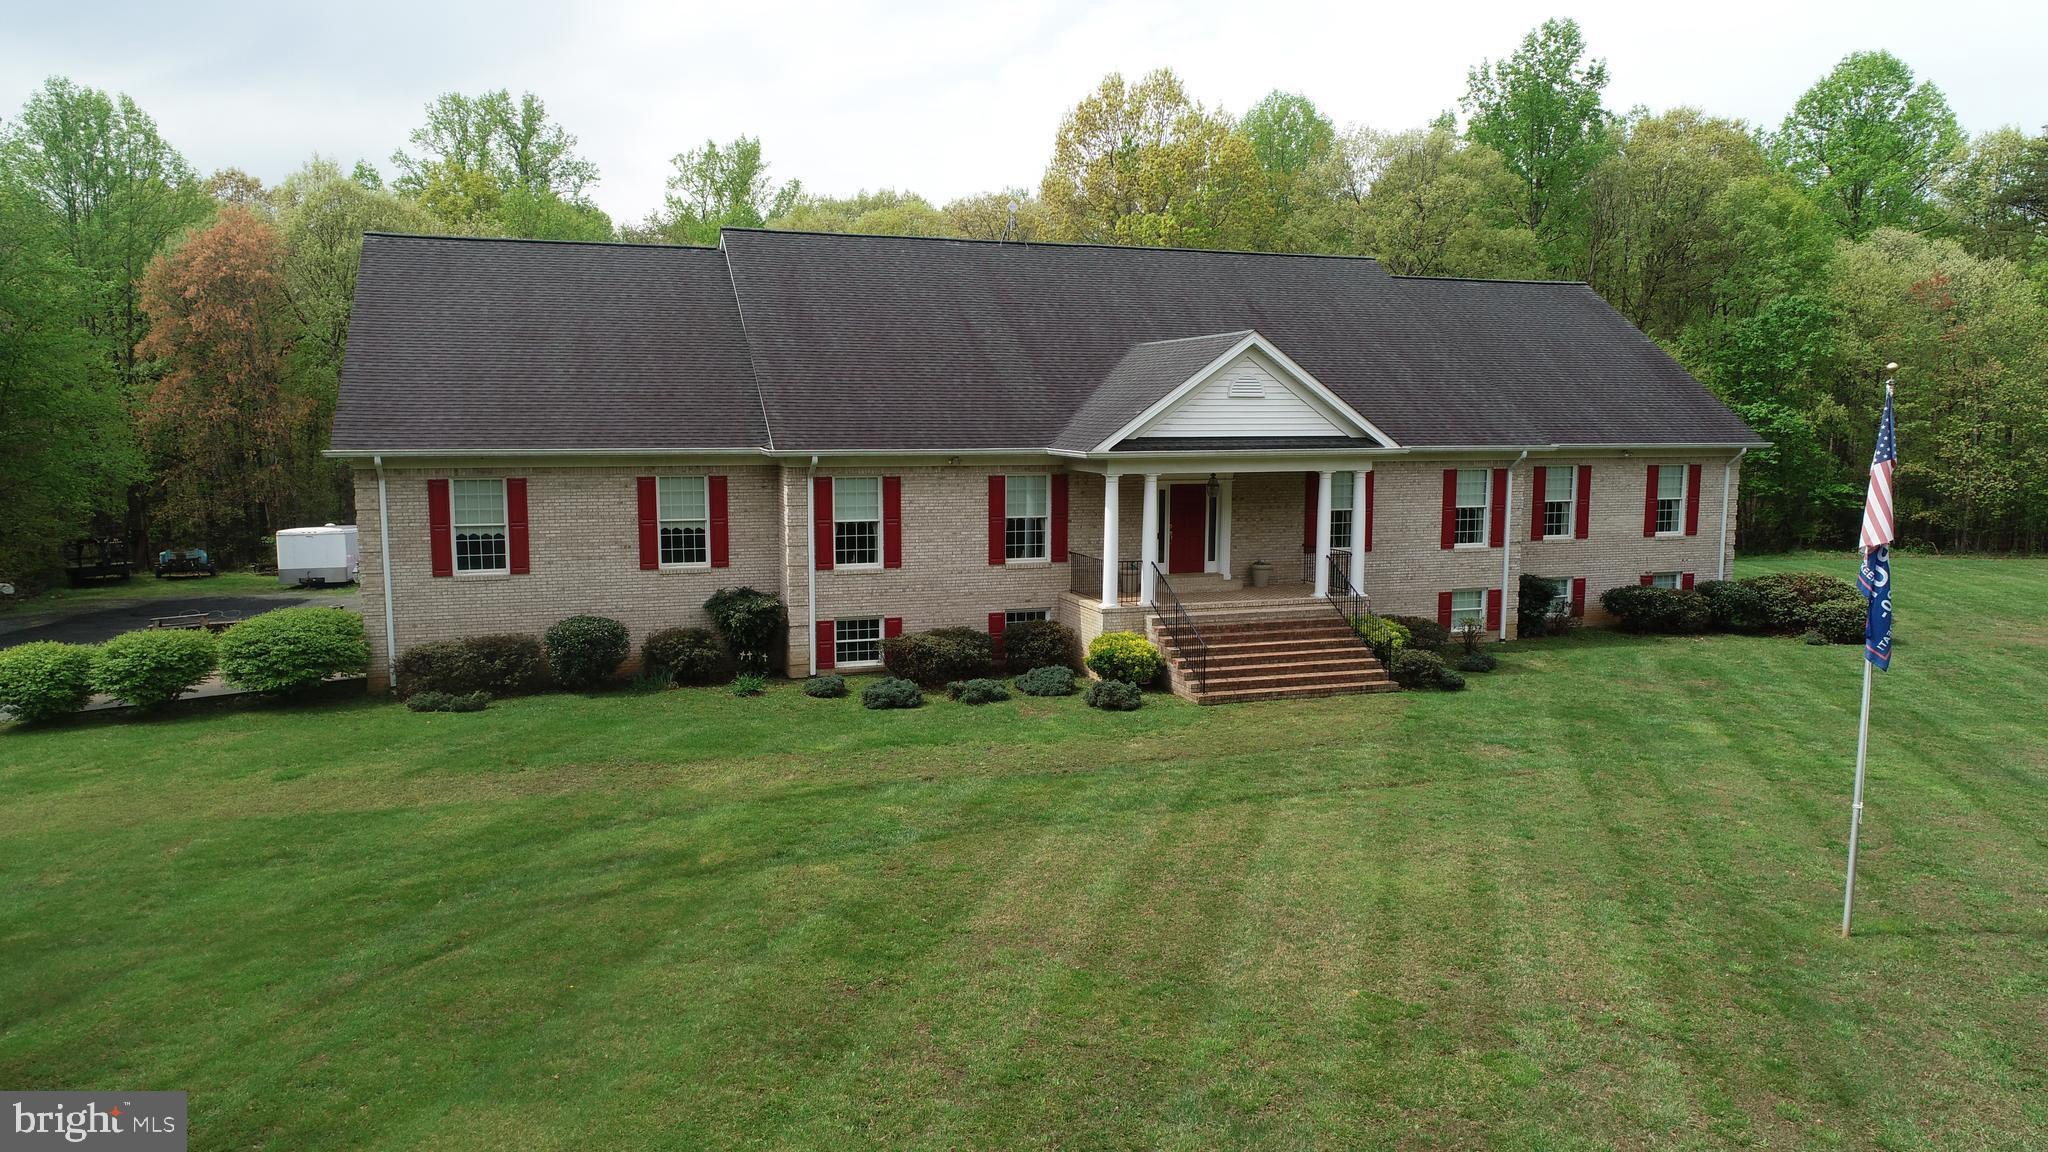 12416 Elk Run Church Road, Midland, VA 22728 now has a new price of $1,600,000!